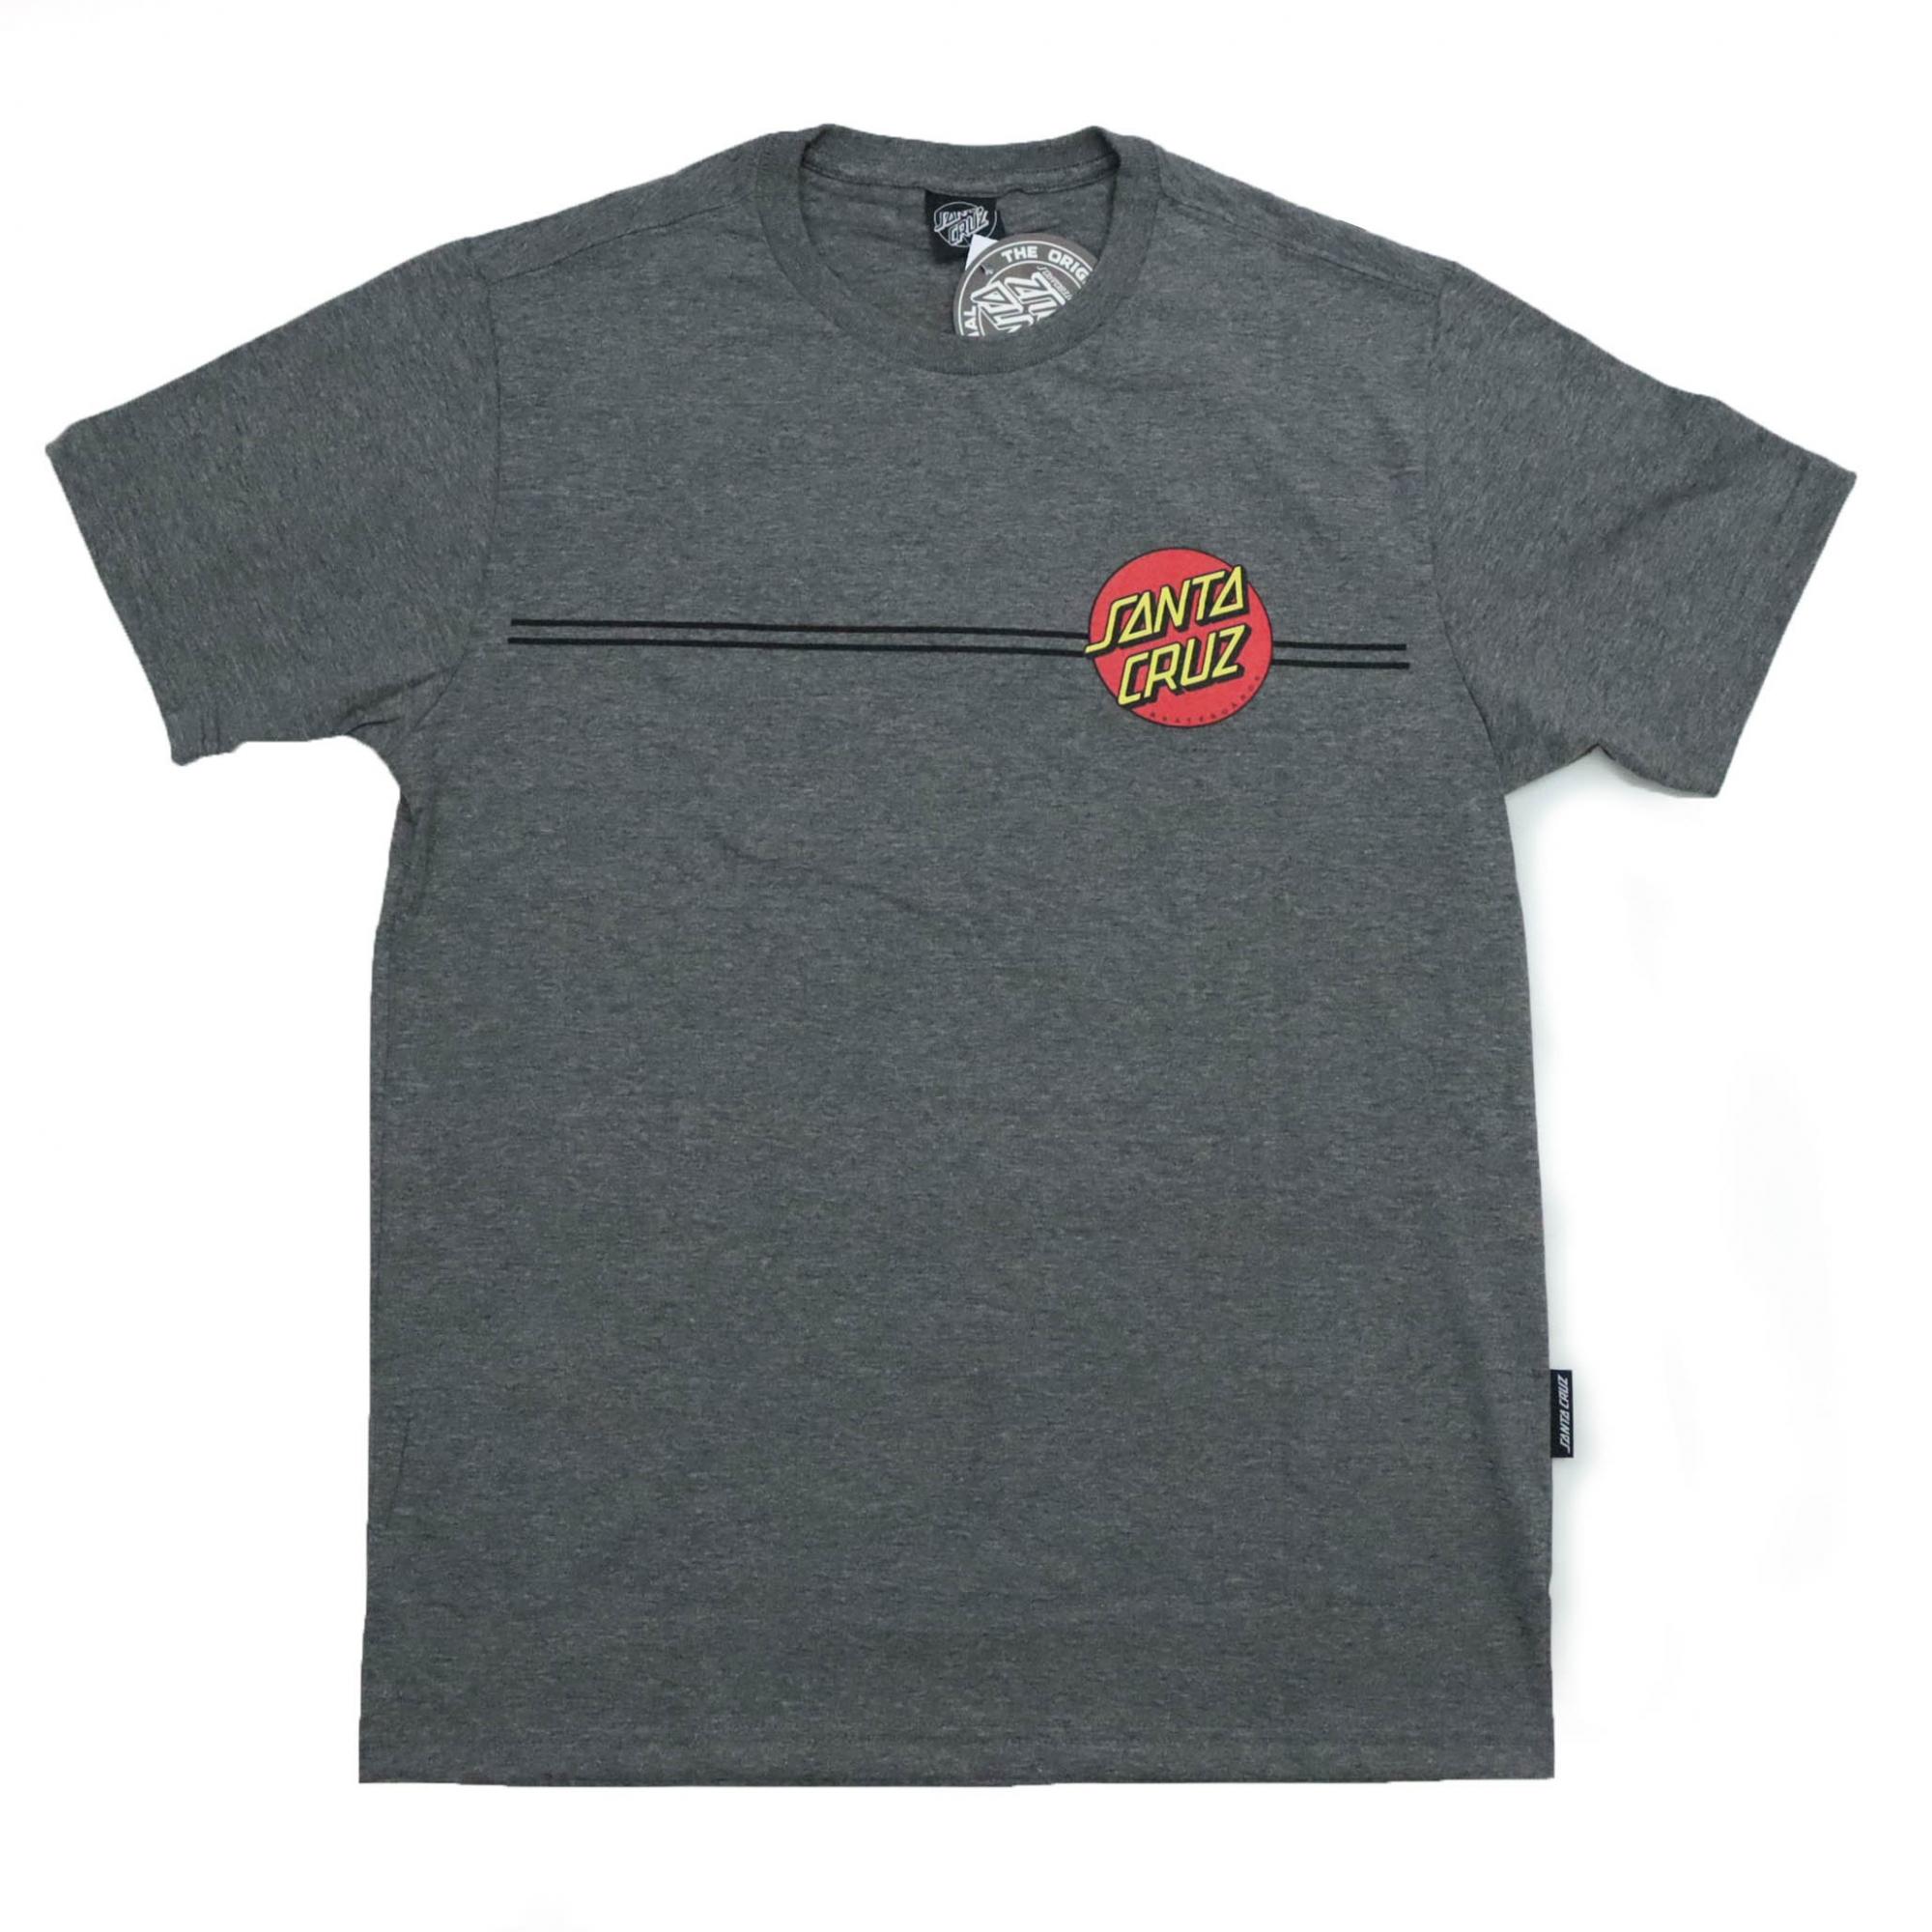 Camiseta Santa Cruz Classic Dot Line - Chumbo Mescla